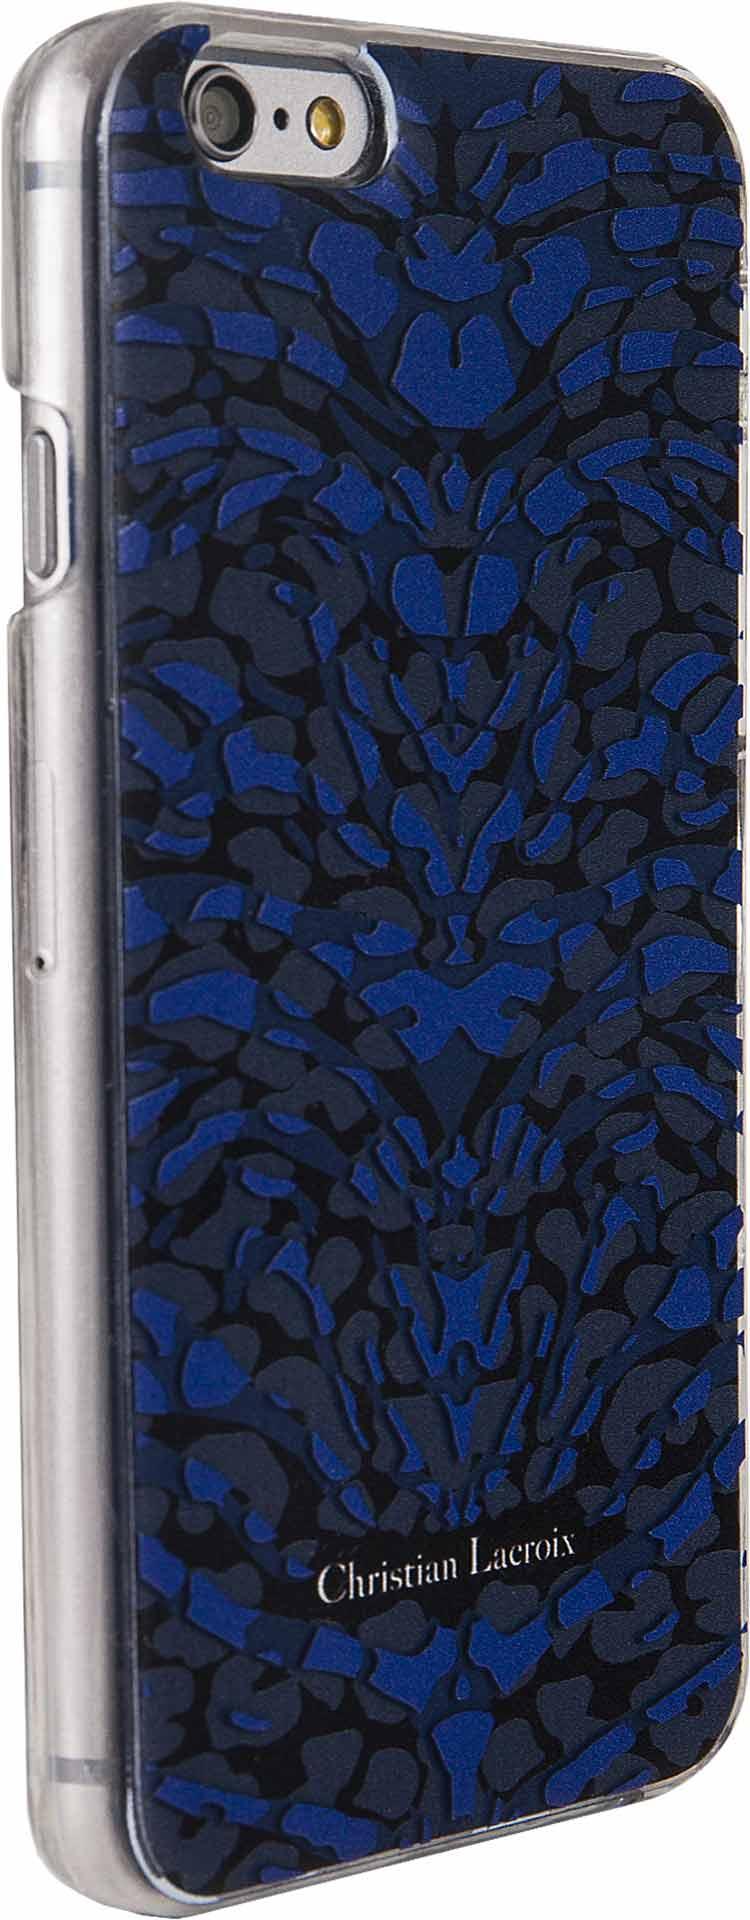 "CHRISTIAN LACROIX Hard Case Pantigre""(Blue)"" - Immagine #1"